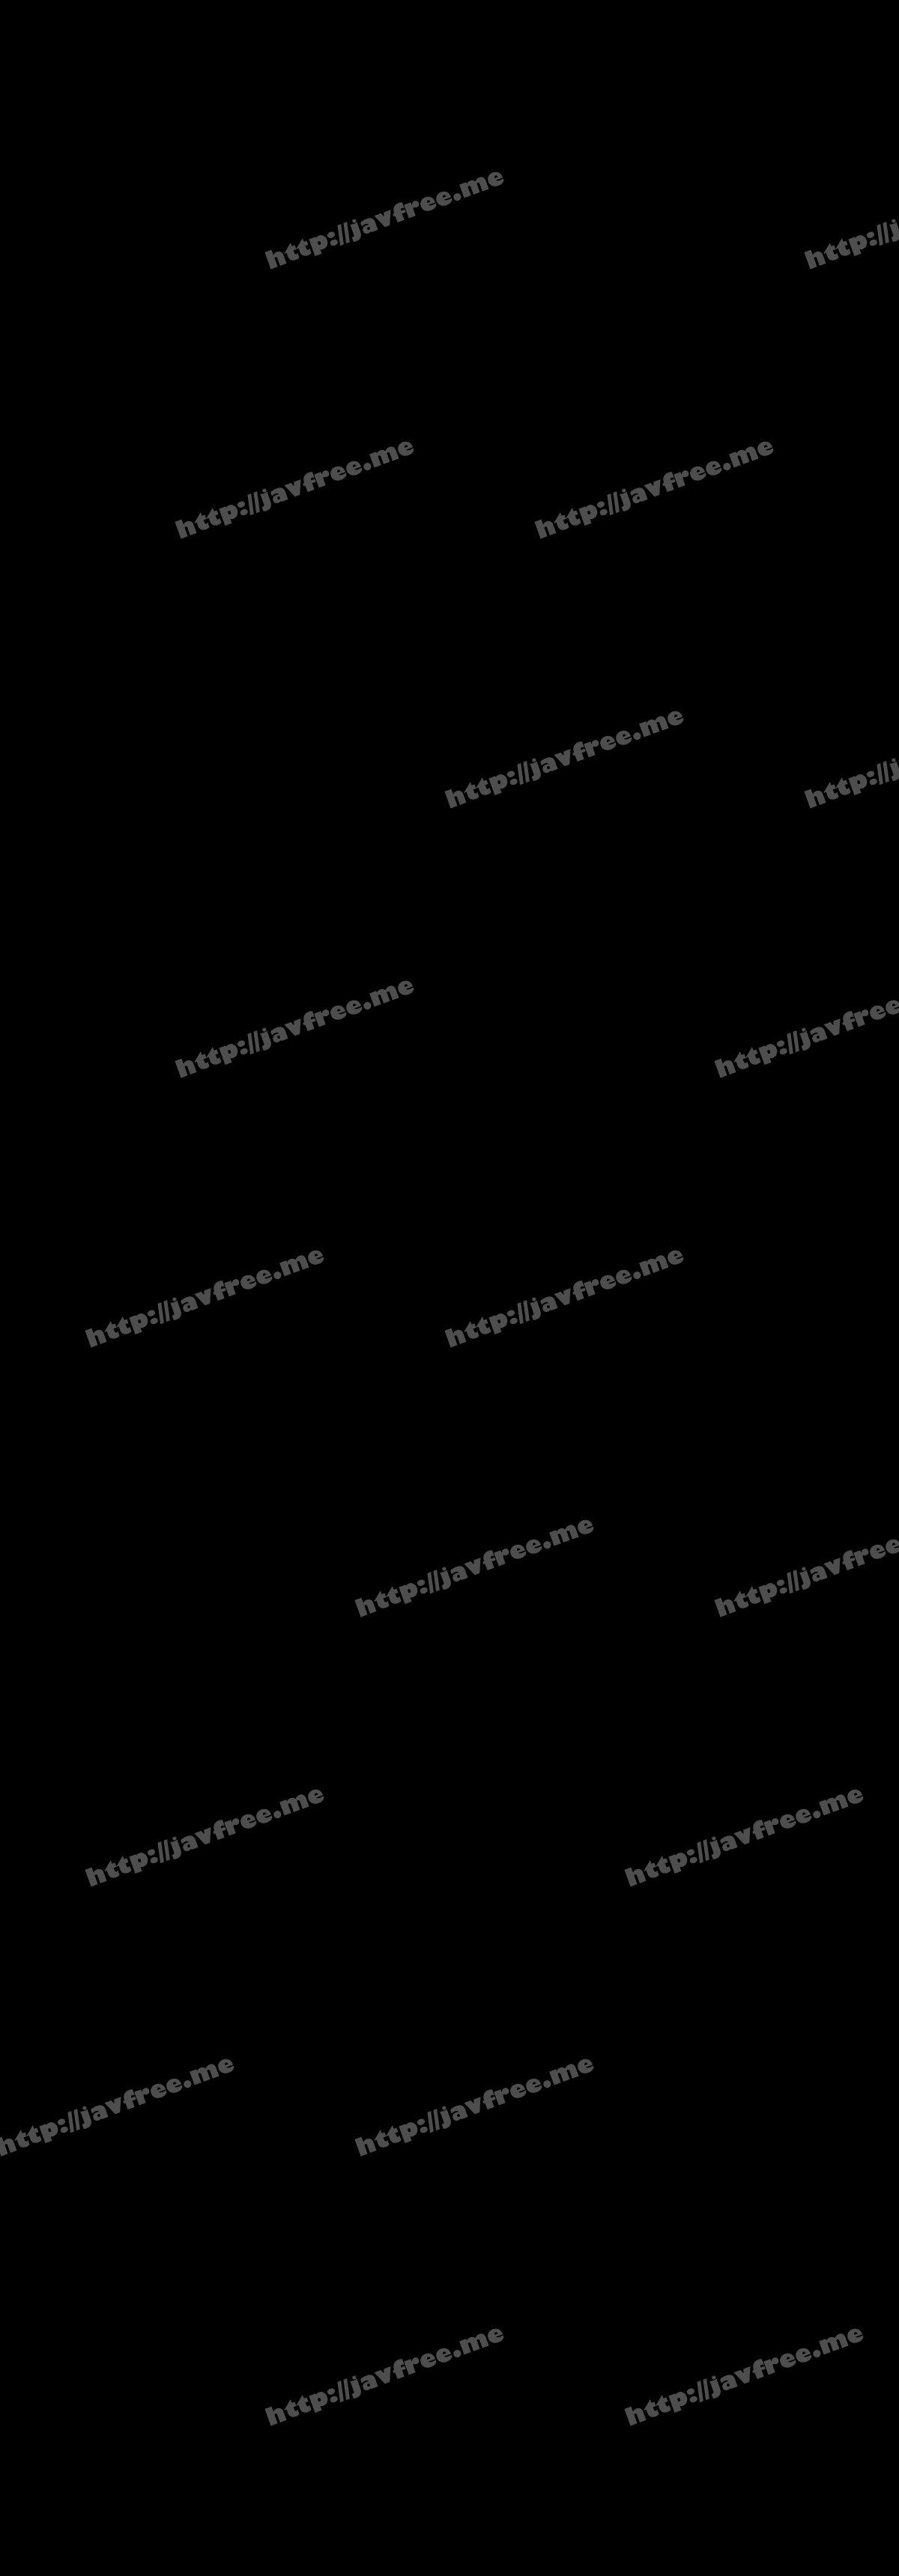 [HD][AOZ-282] 高級派遣マッサージレイプ投稿映像 - image DNW-044b-1080p on https://javfree.me